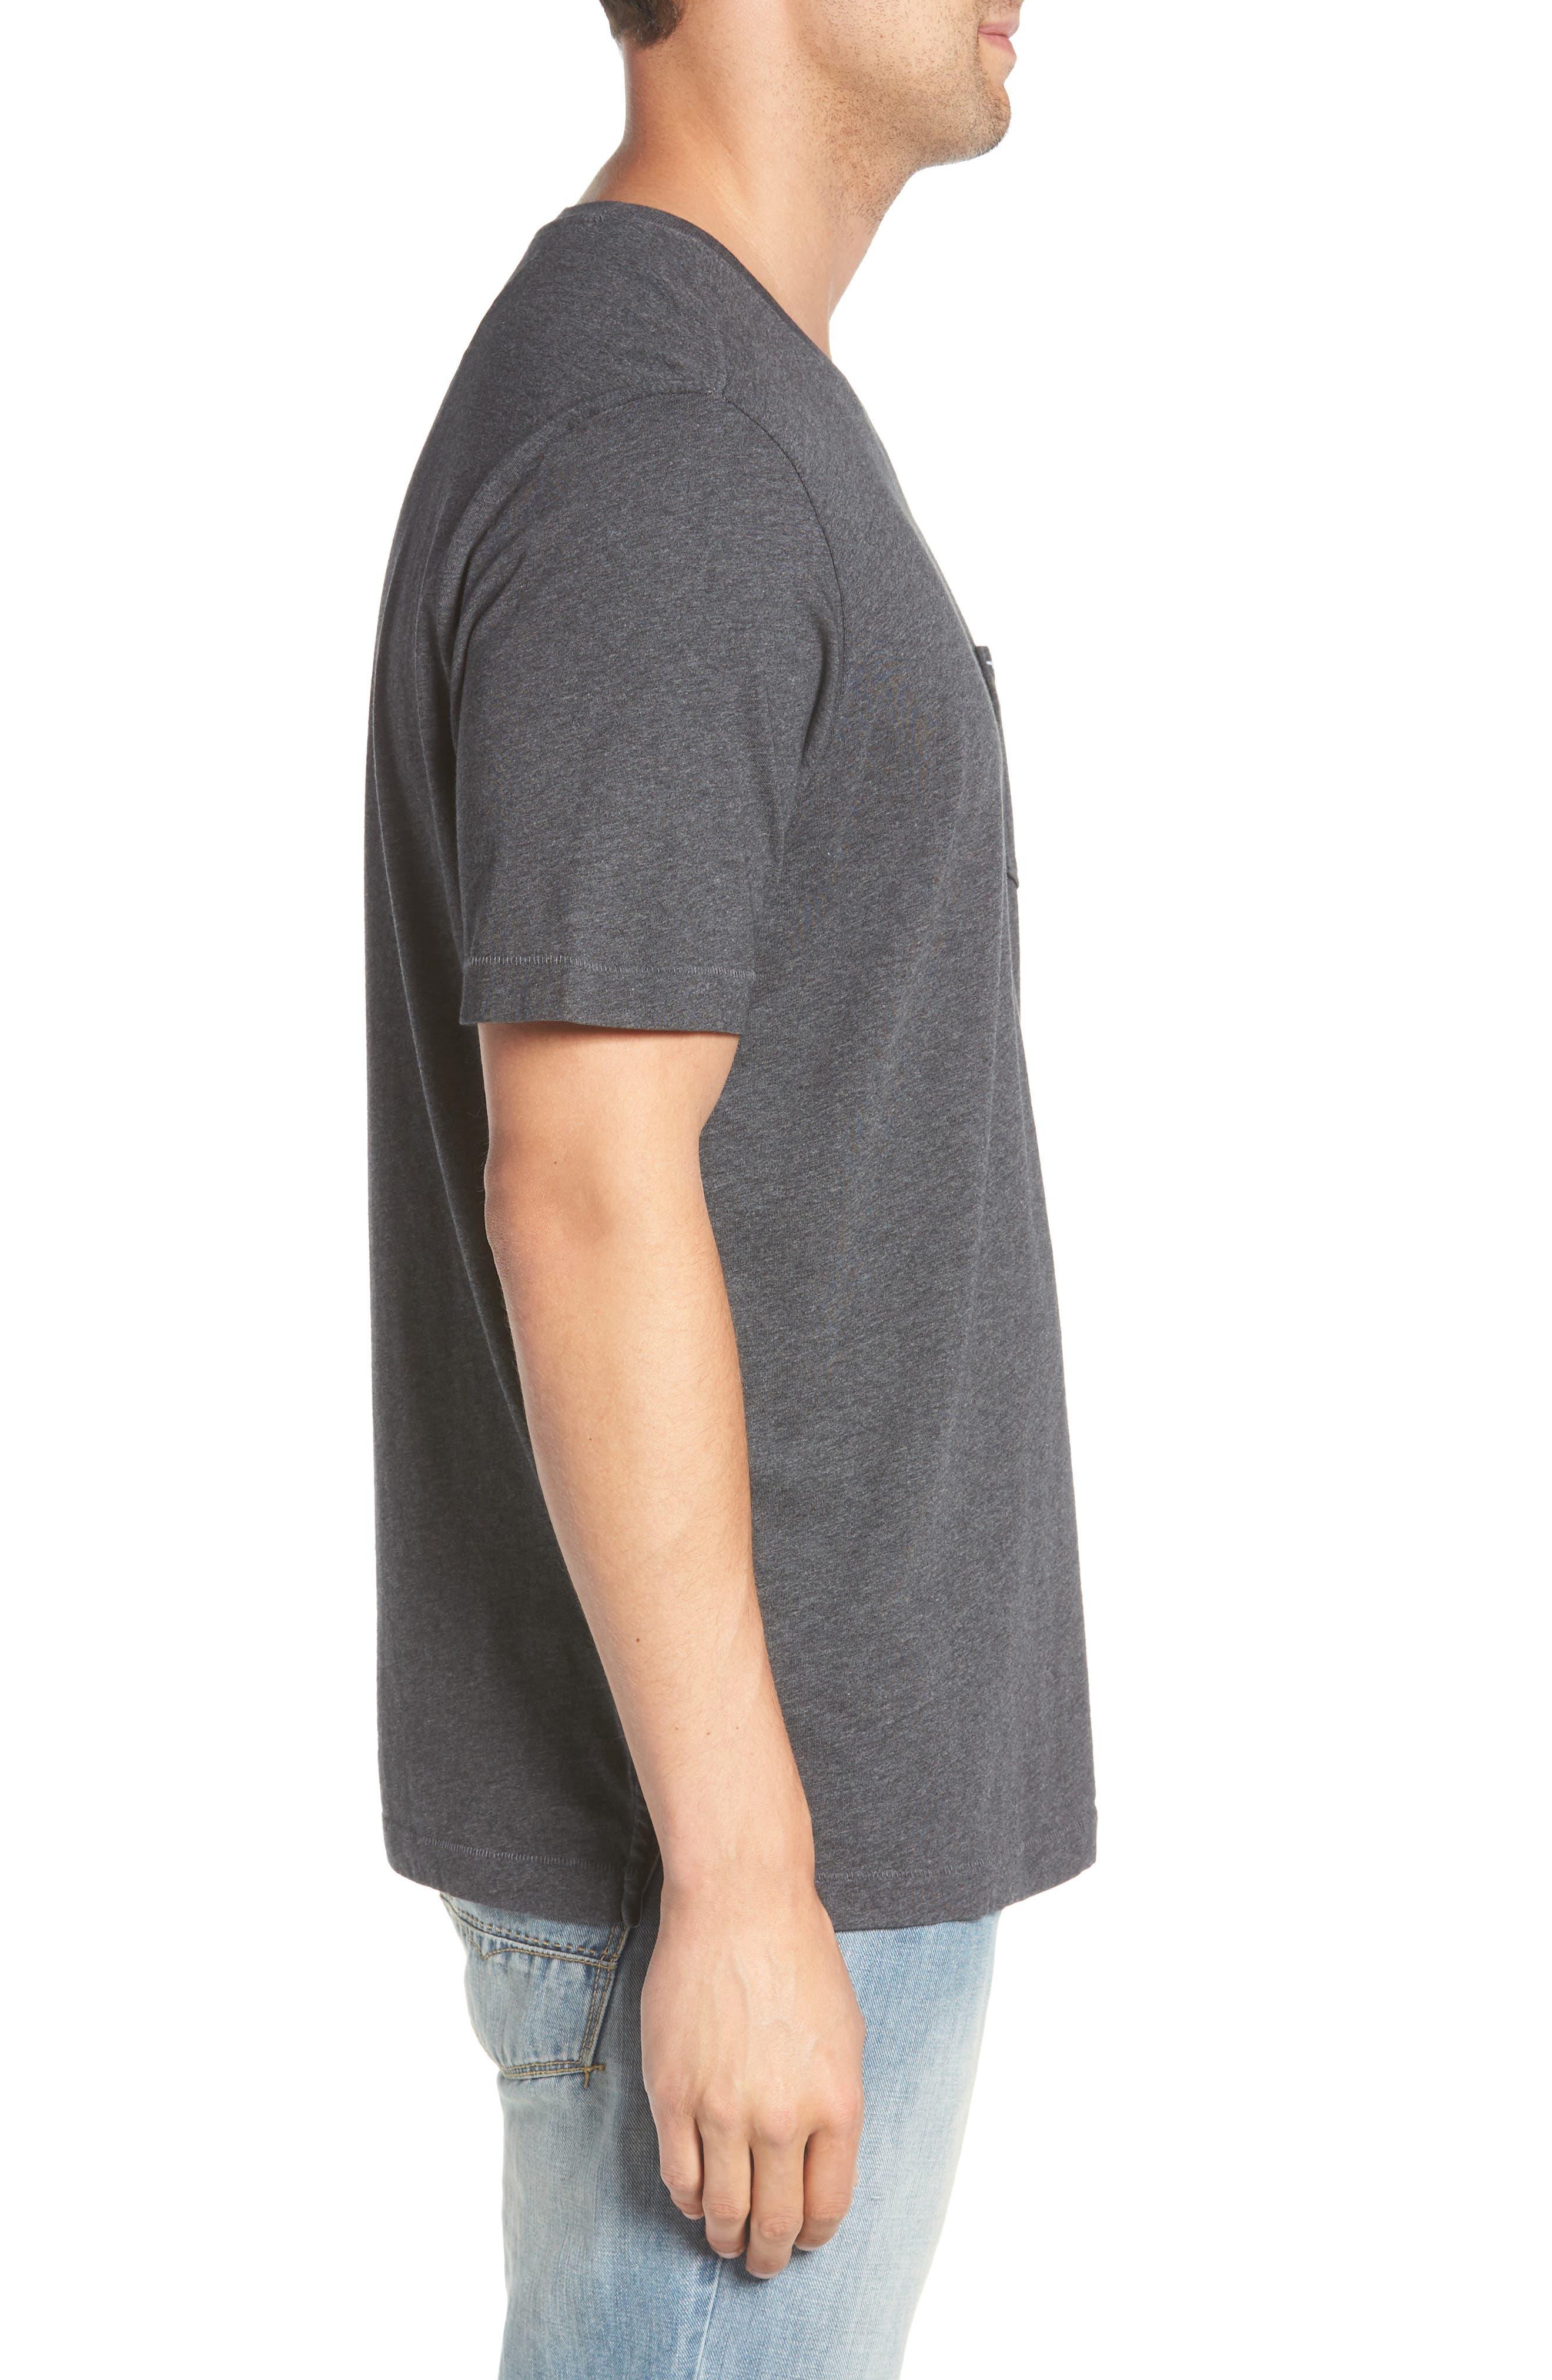 TOMMY BAHAMA, 'New Bali Sky' Original Fit Crewneck Pocket T-Shirt, Alternate thumbnail 3, color, CHARCOAL HEATHER